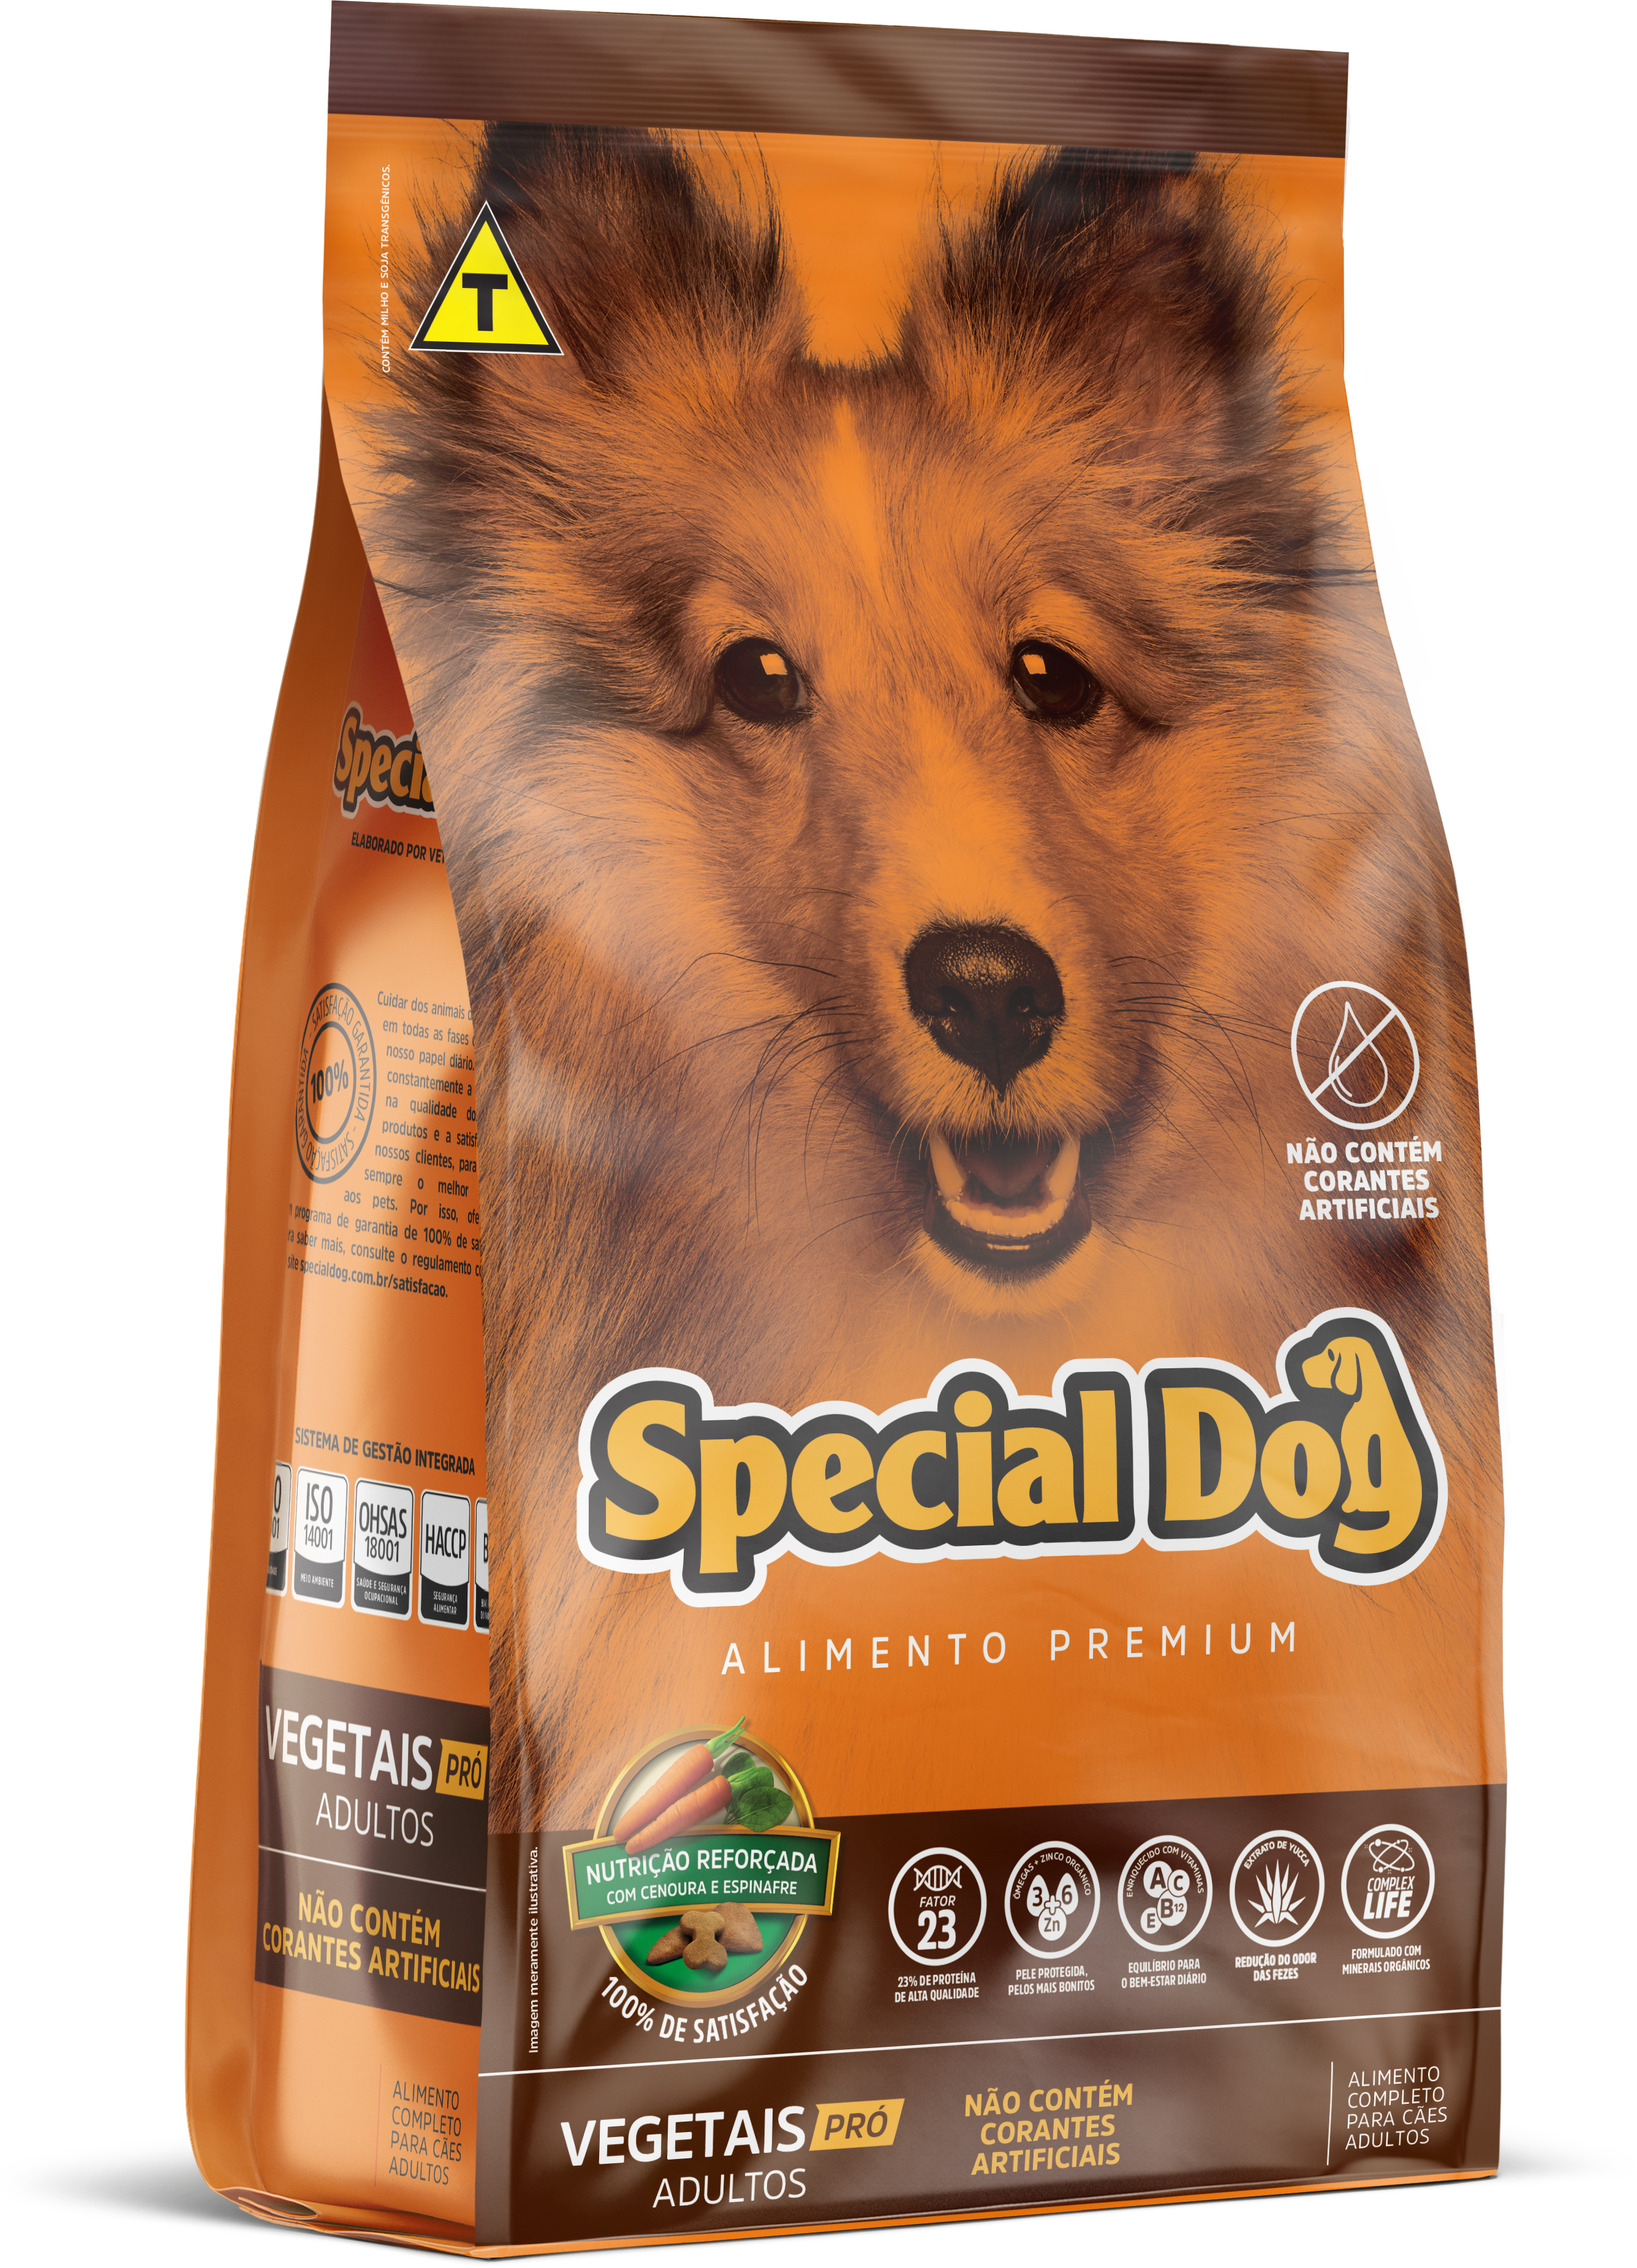 SPECIAL DOG VEGETAIS PRÓ ADULTOS